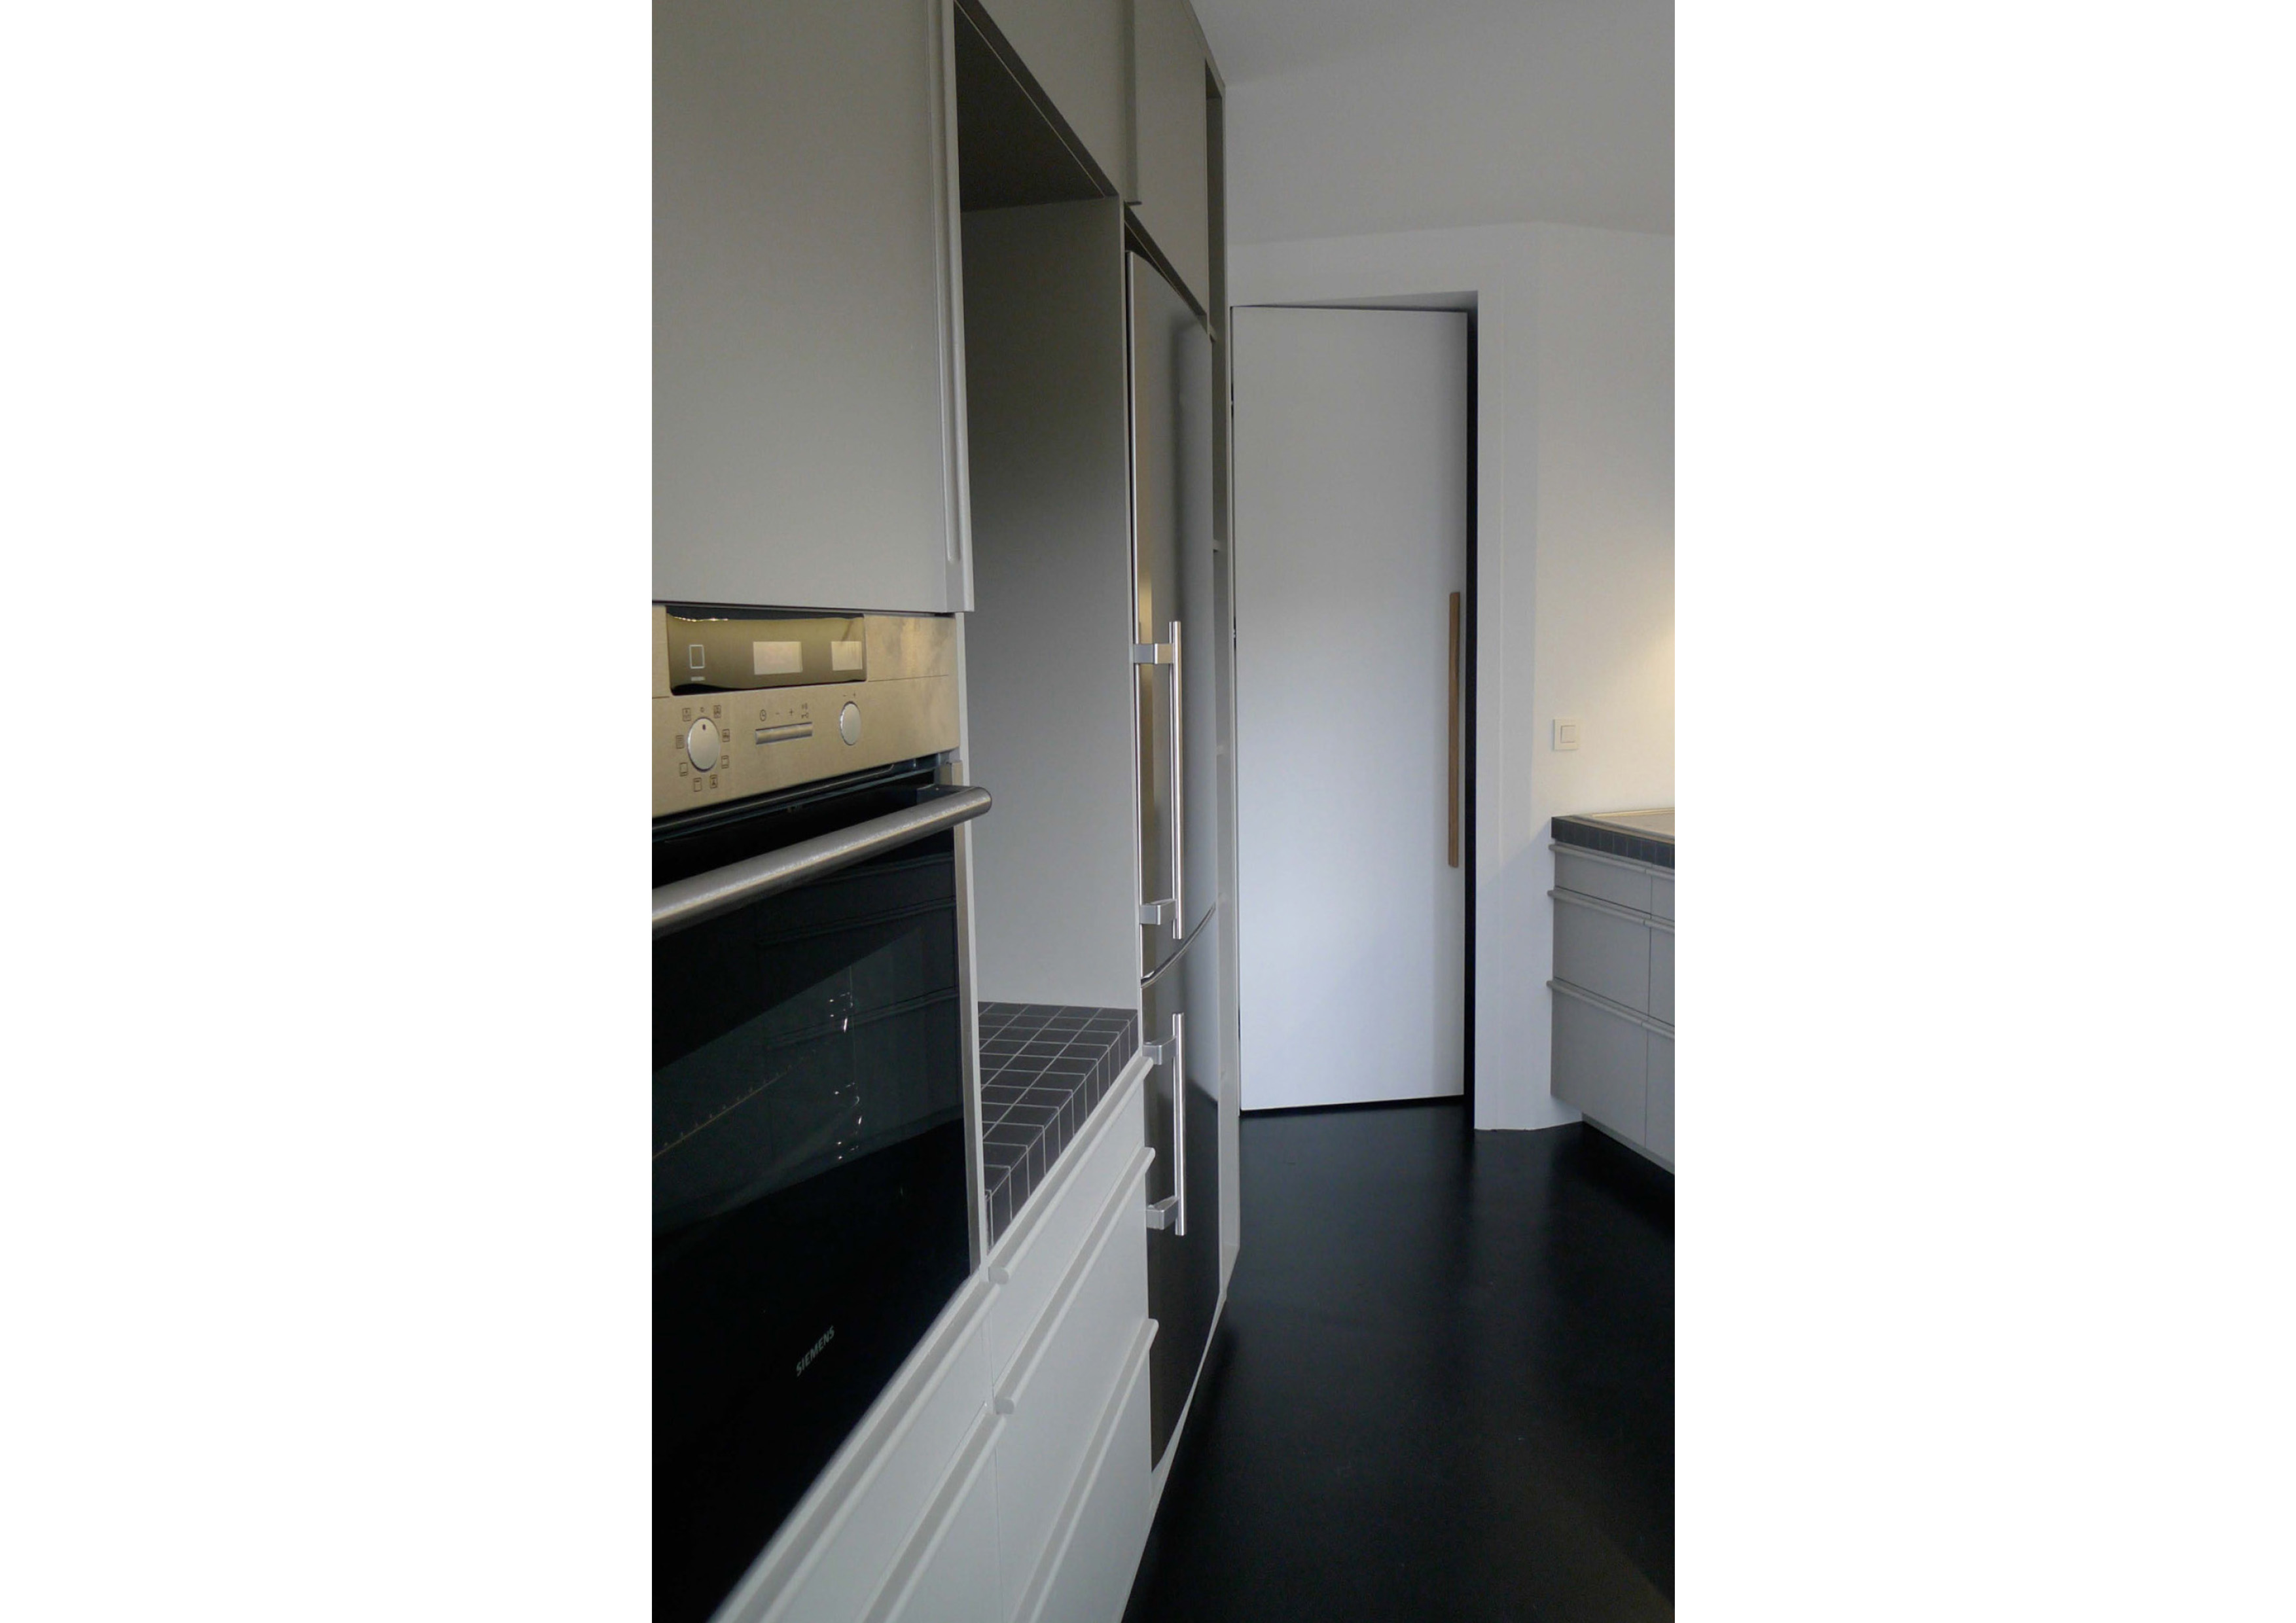 ameliemorinbernat.com cuisine emaux